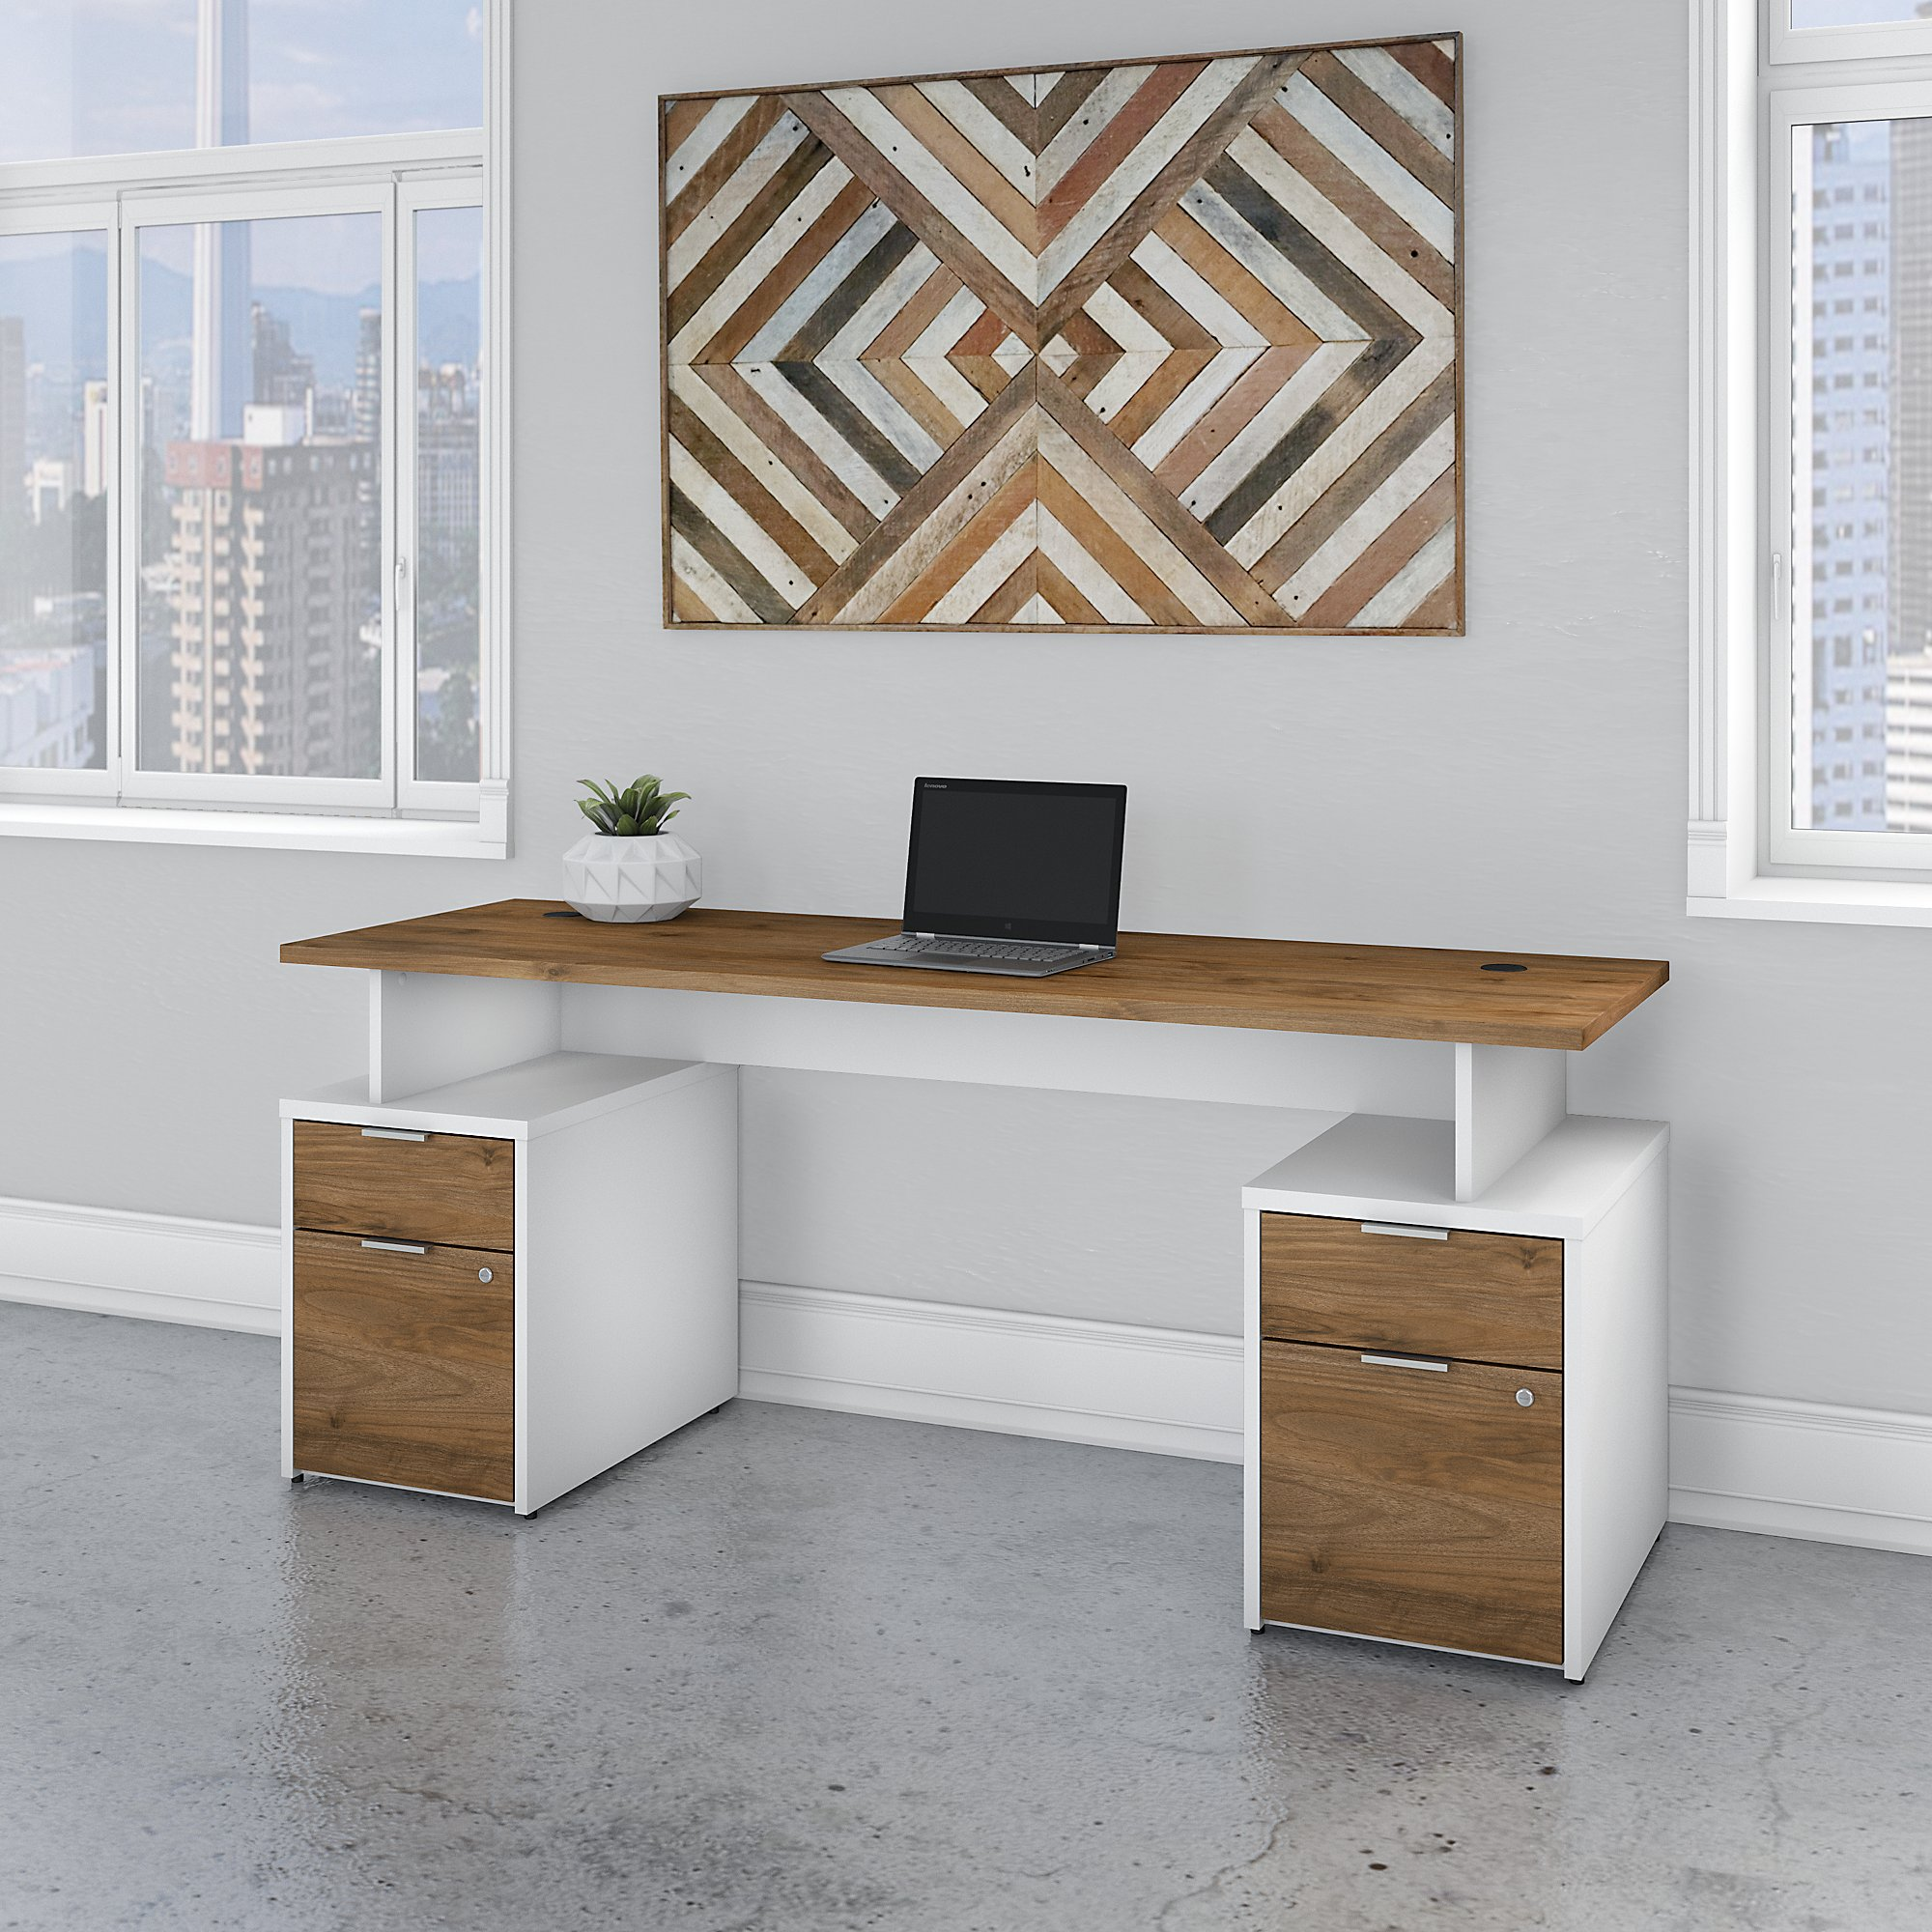 jtn005 fresh walnut and white jamestown desk